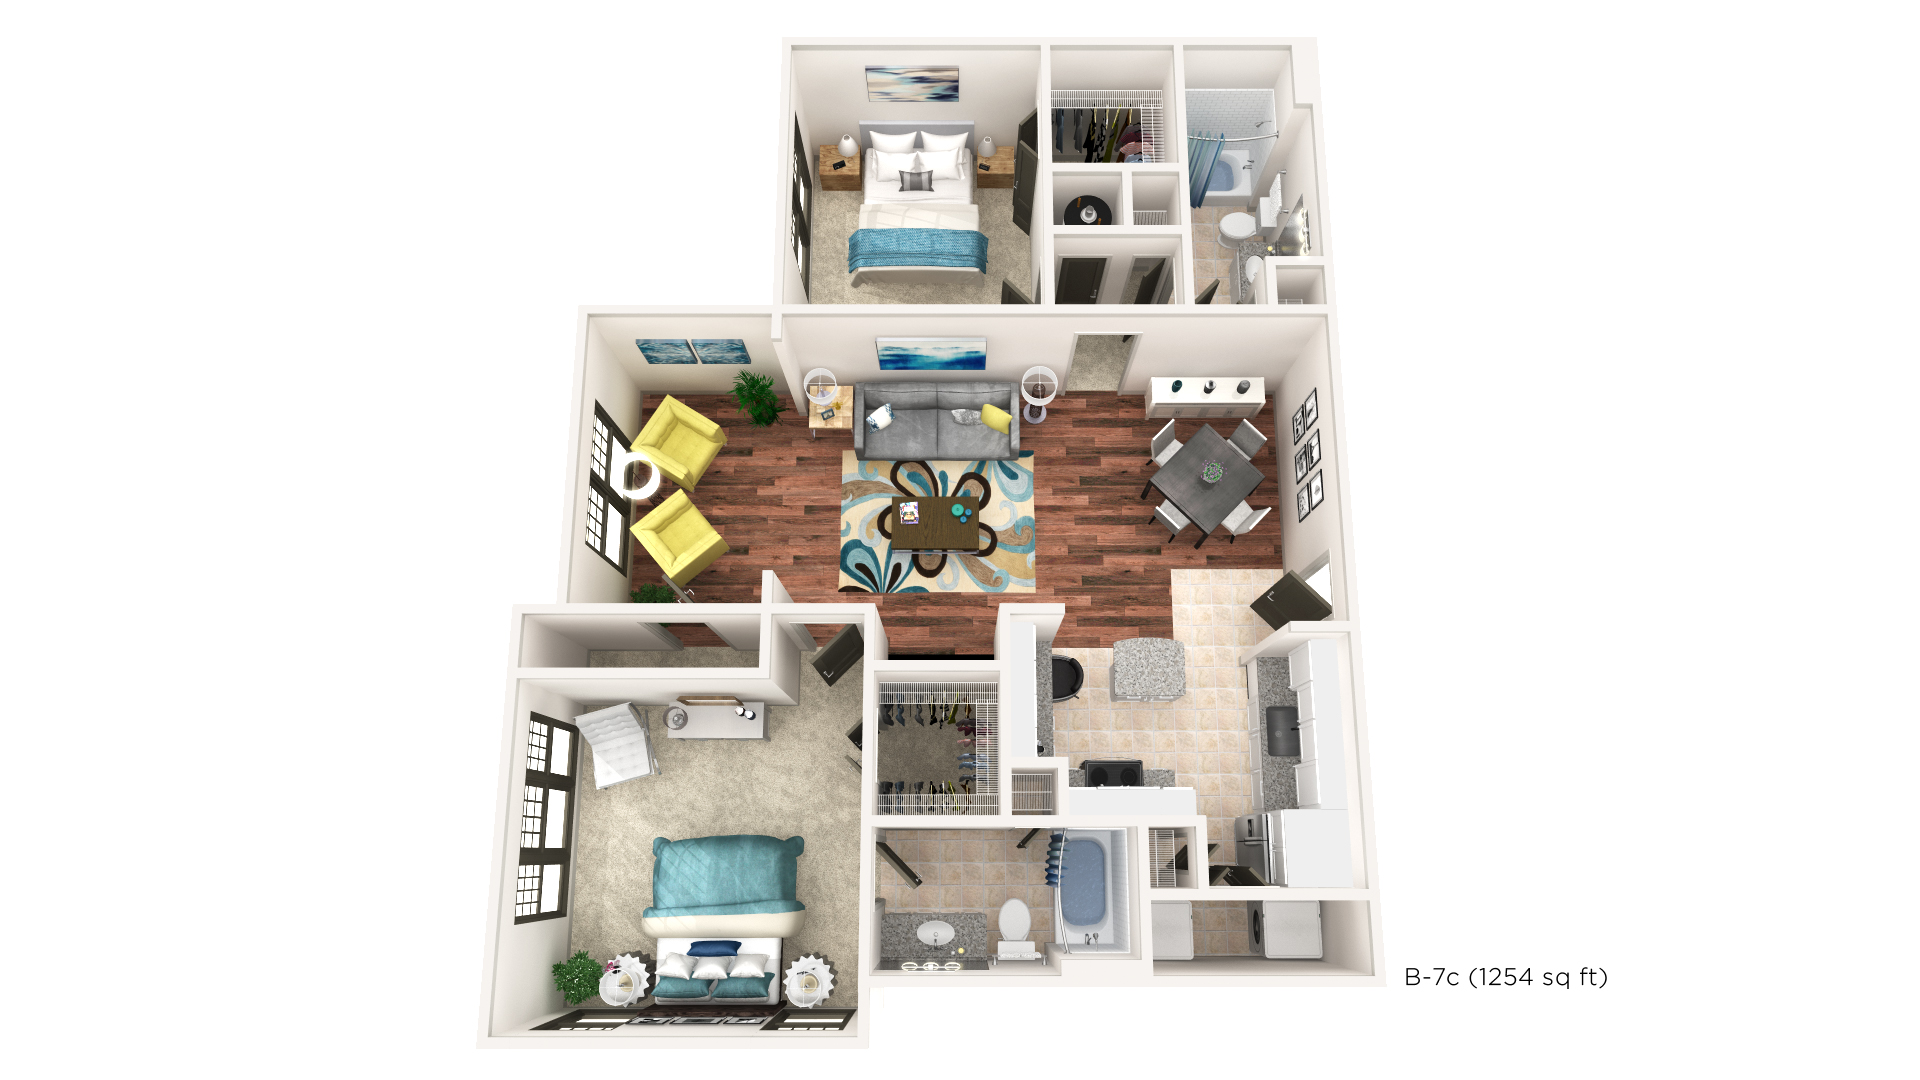 Floorplan - B-7C image